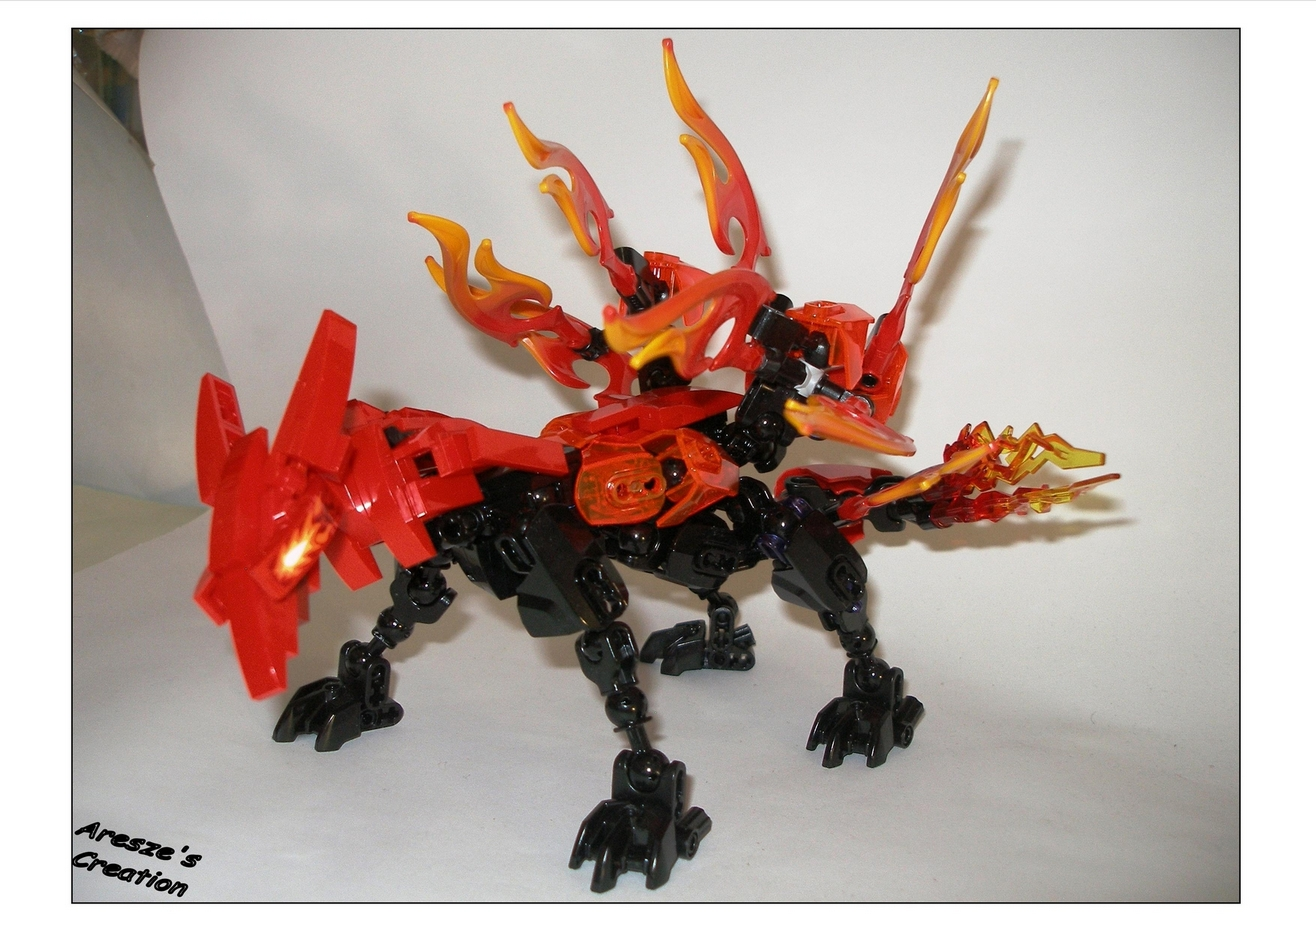 aresze moc - Nine-tailed Fox 016